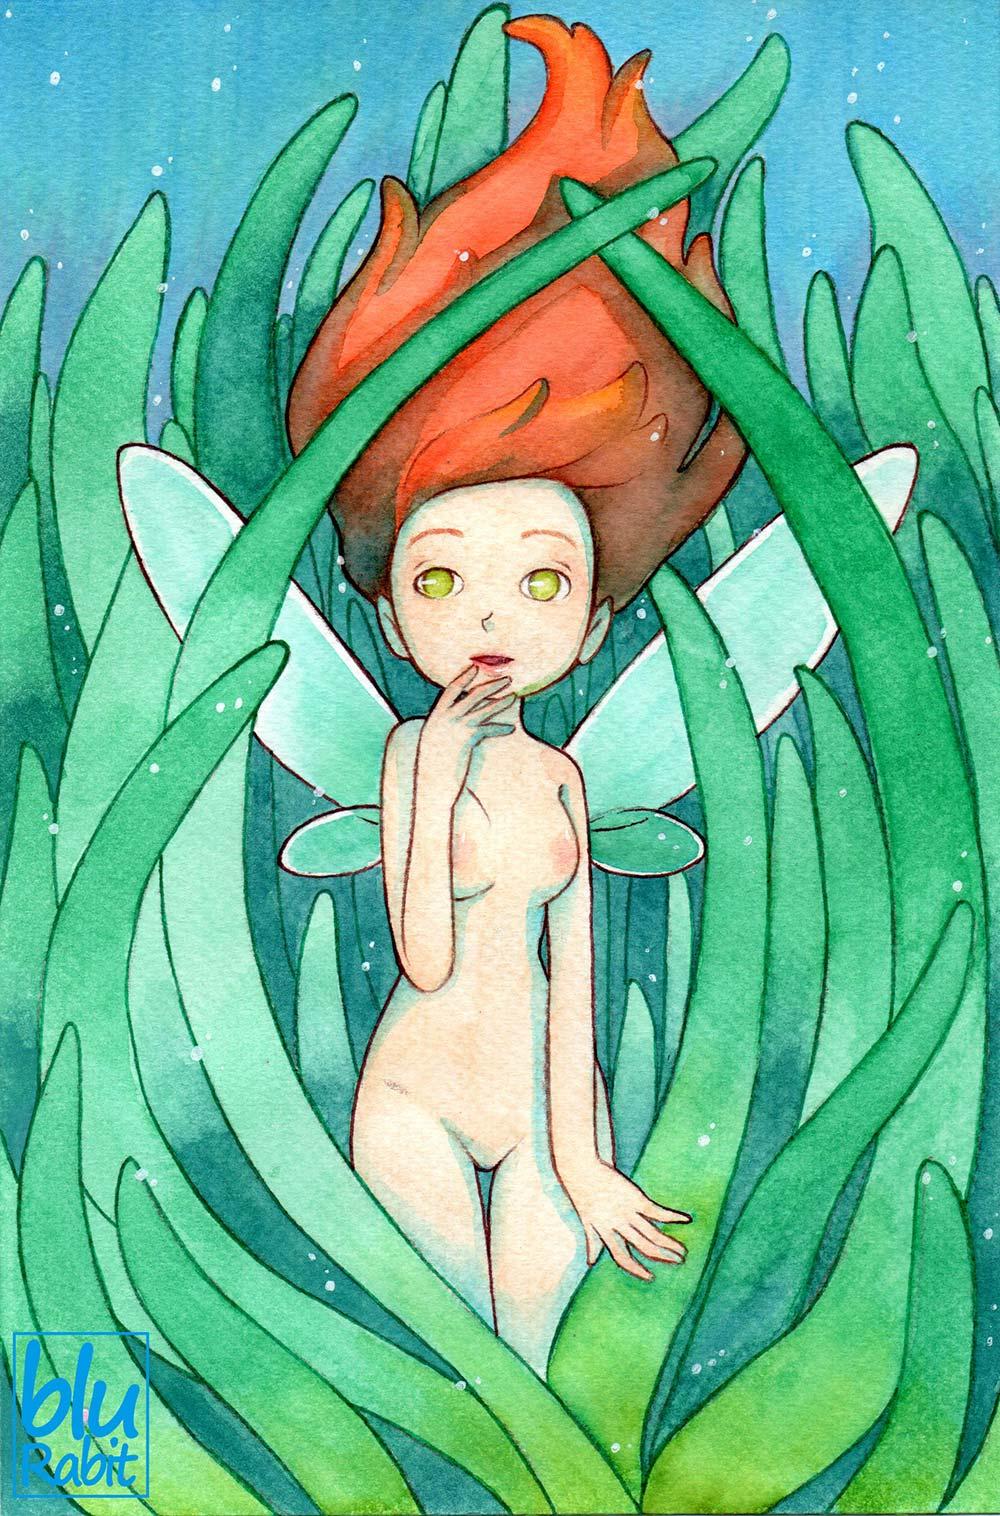 Ilustracion de BluRabit - Ilustradores chilenos por 2Design Blog